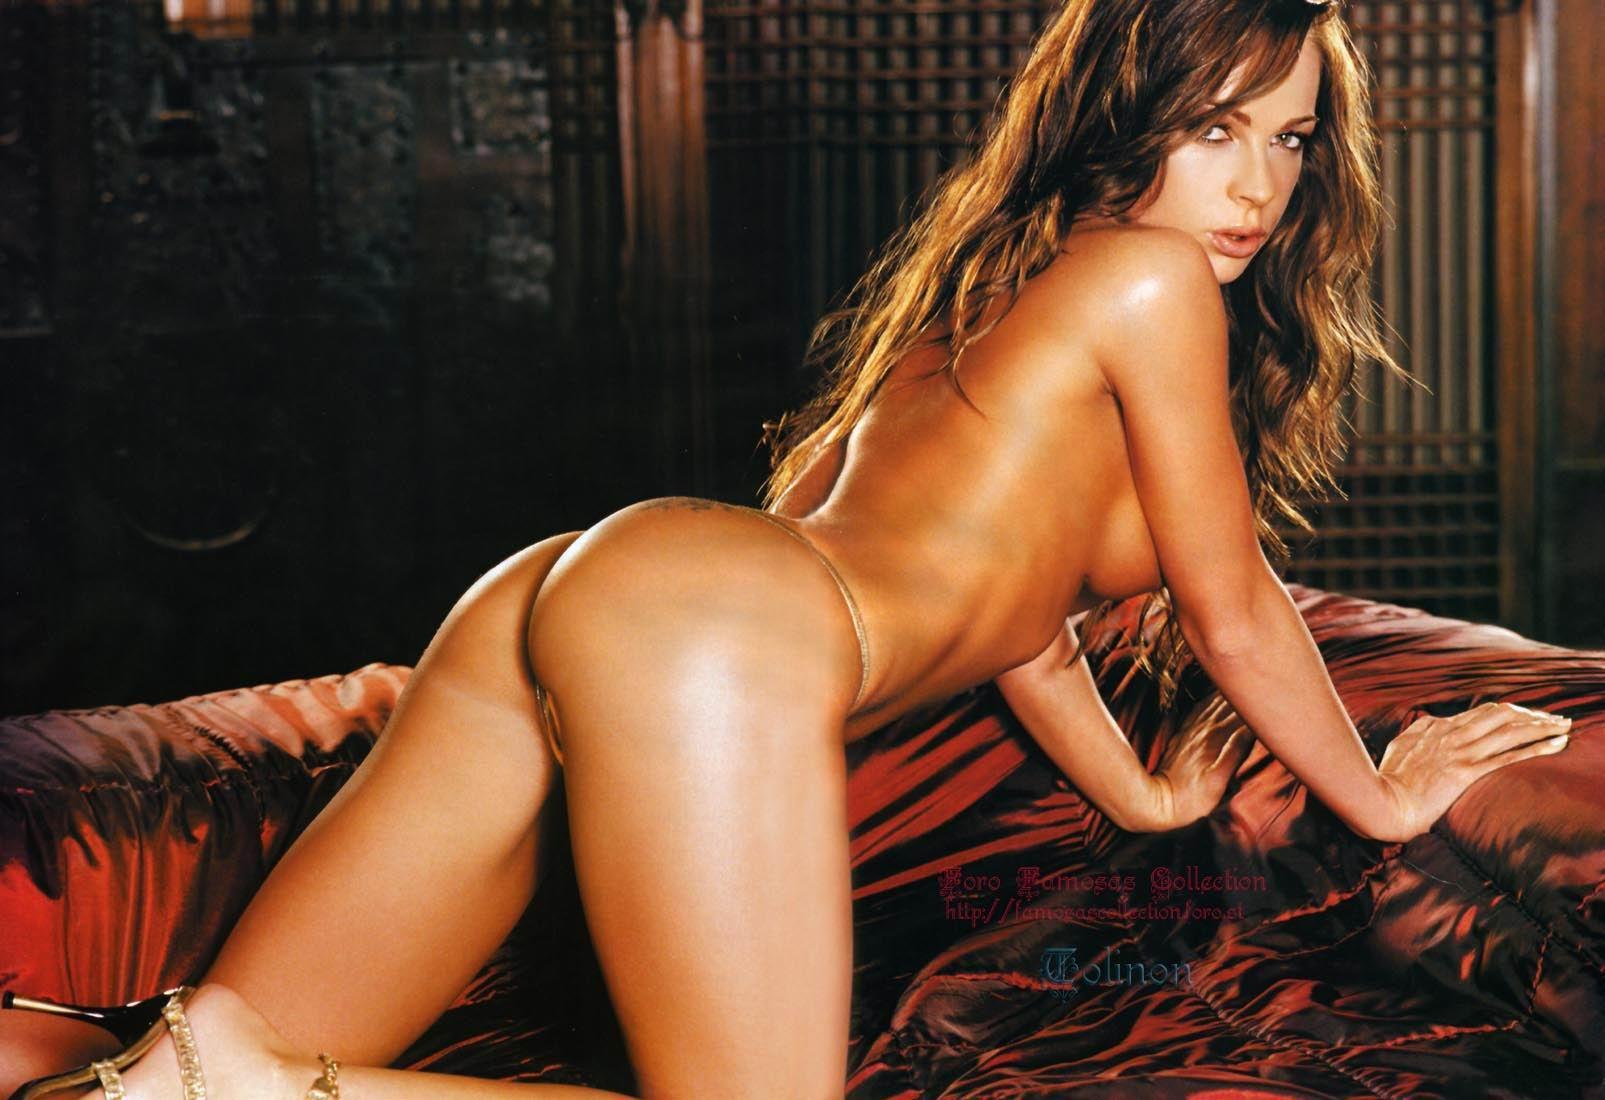 Imogen bailey nude video